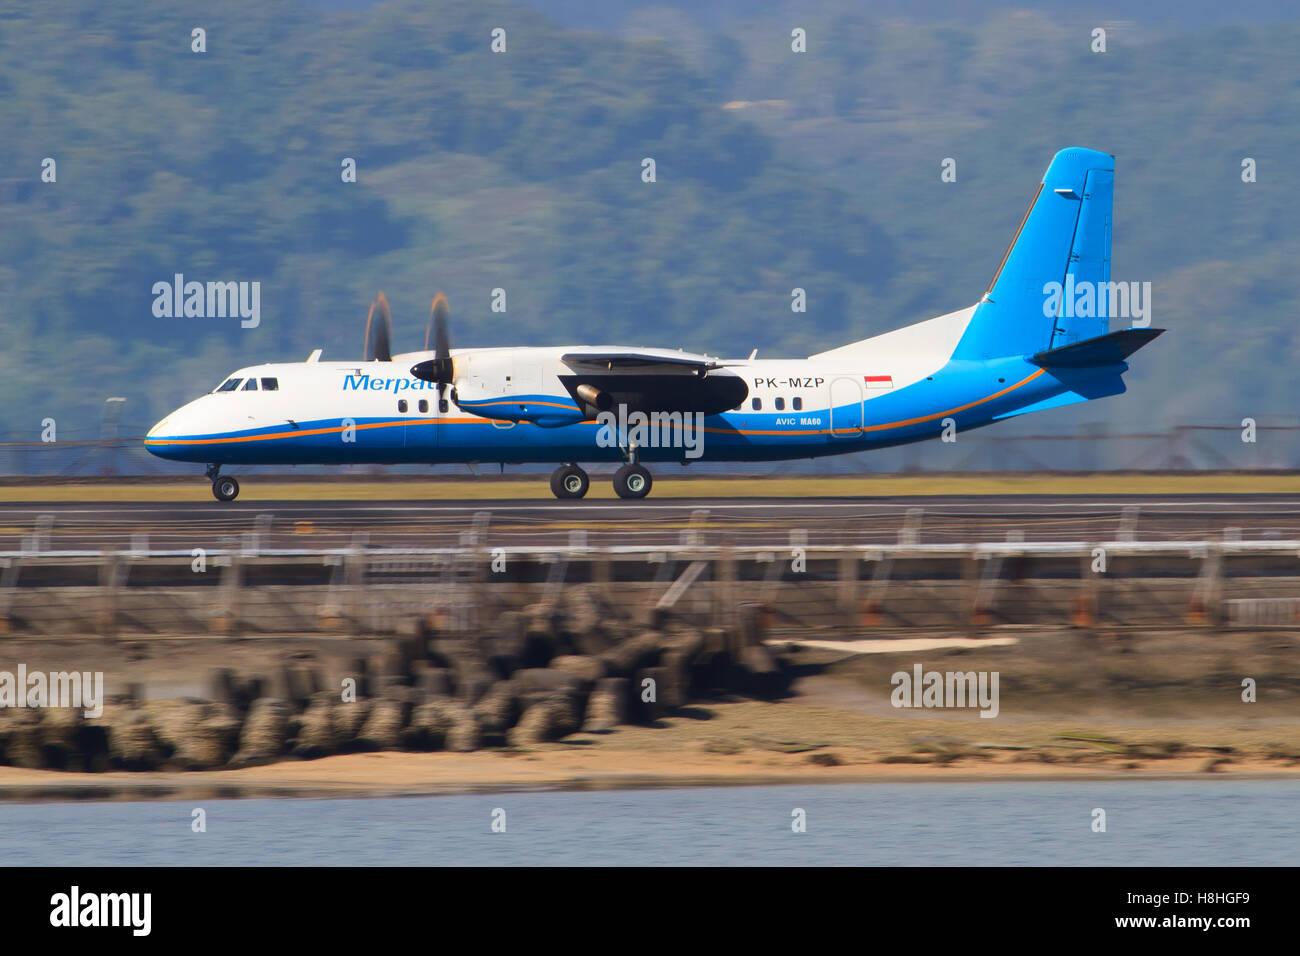 Bali/Indonesia Februar 19, 2013: Xiâ??an MA60 from Xiâ??an MA60 takeoff at Bali Airport. - Stock Image